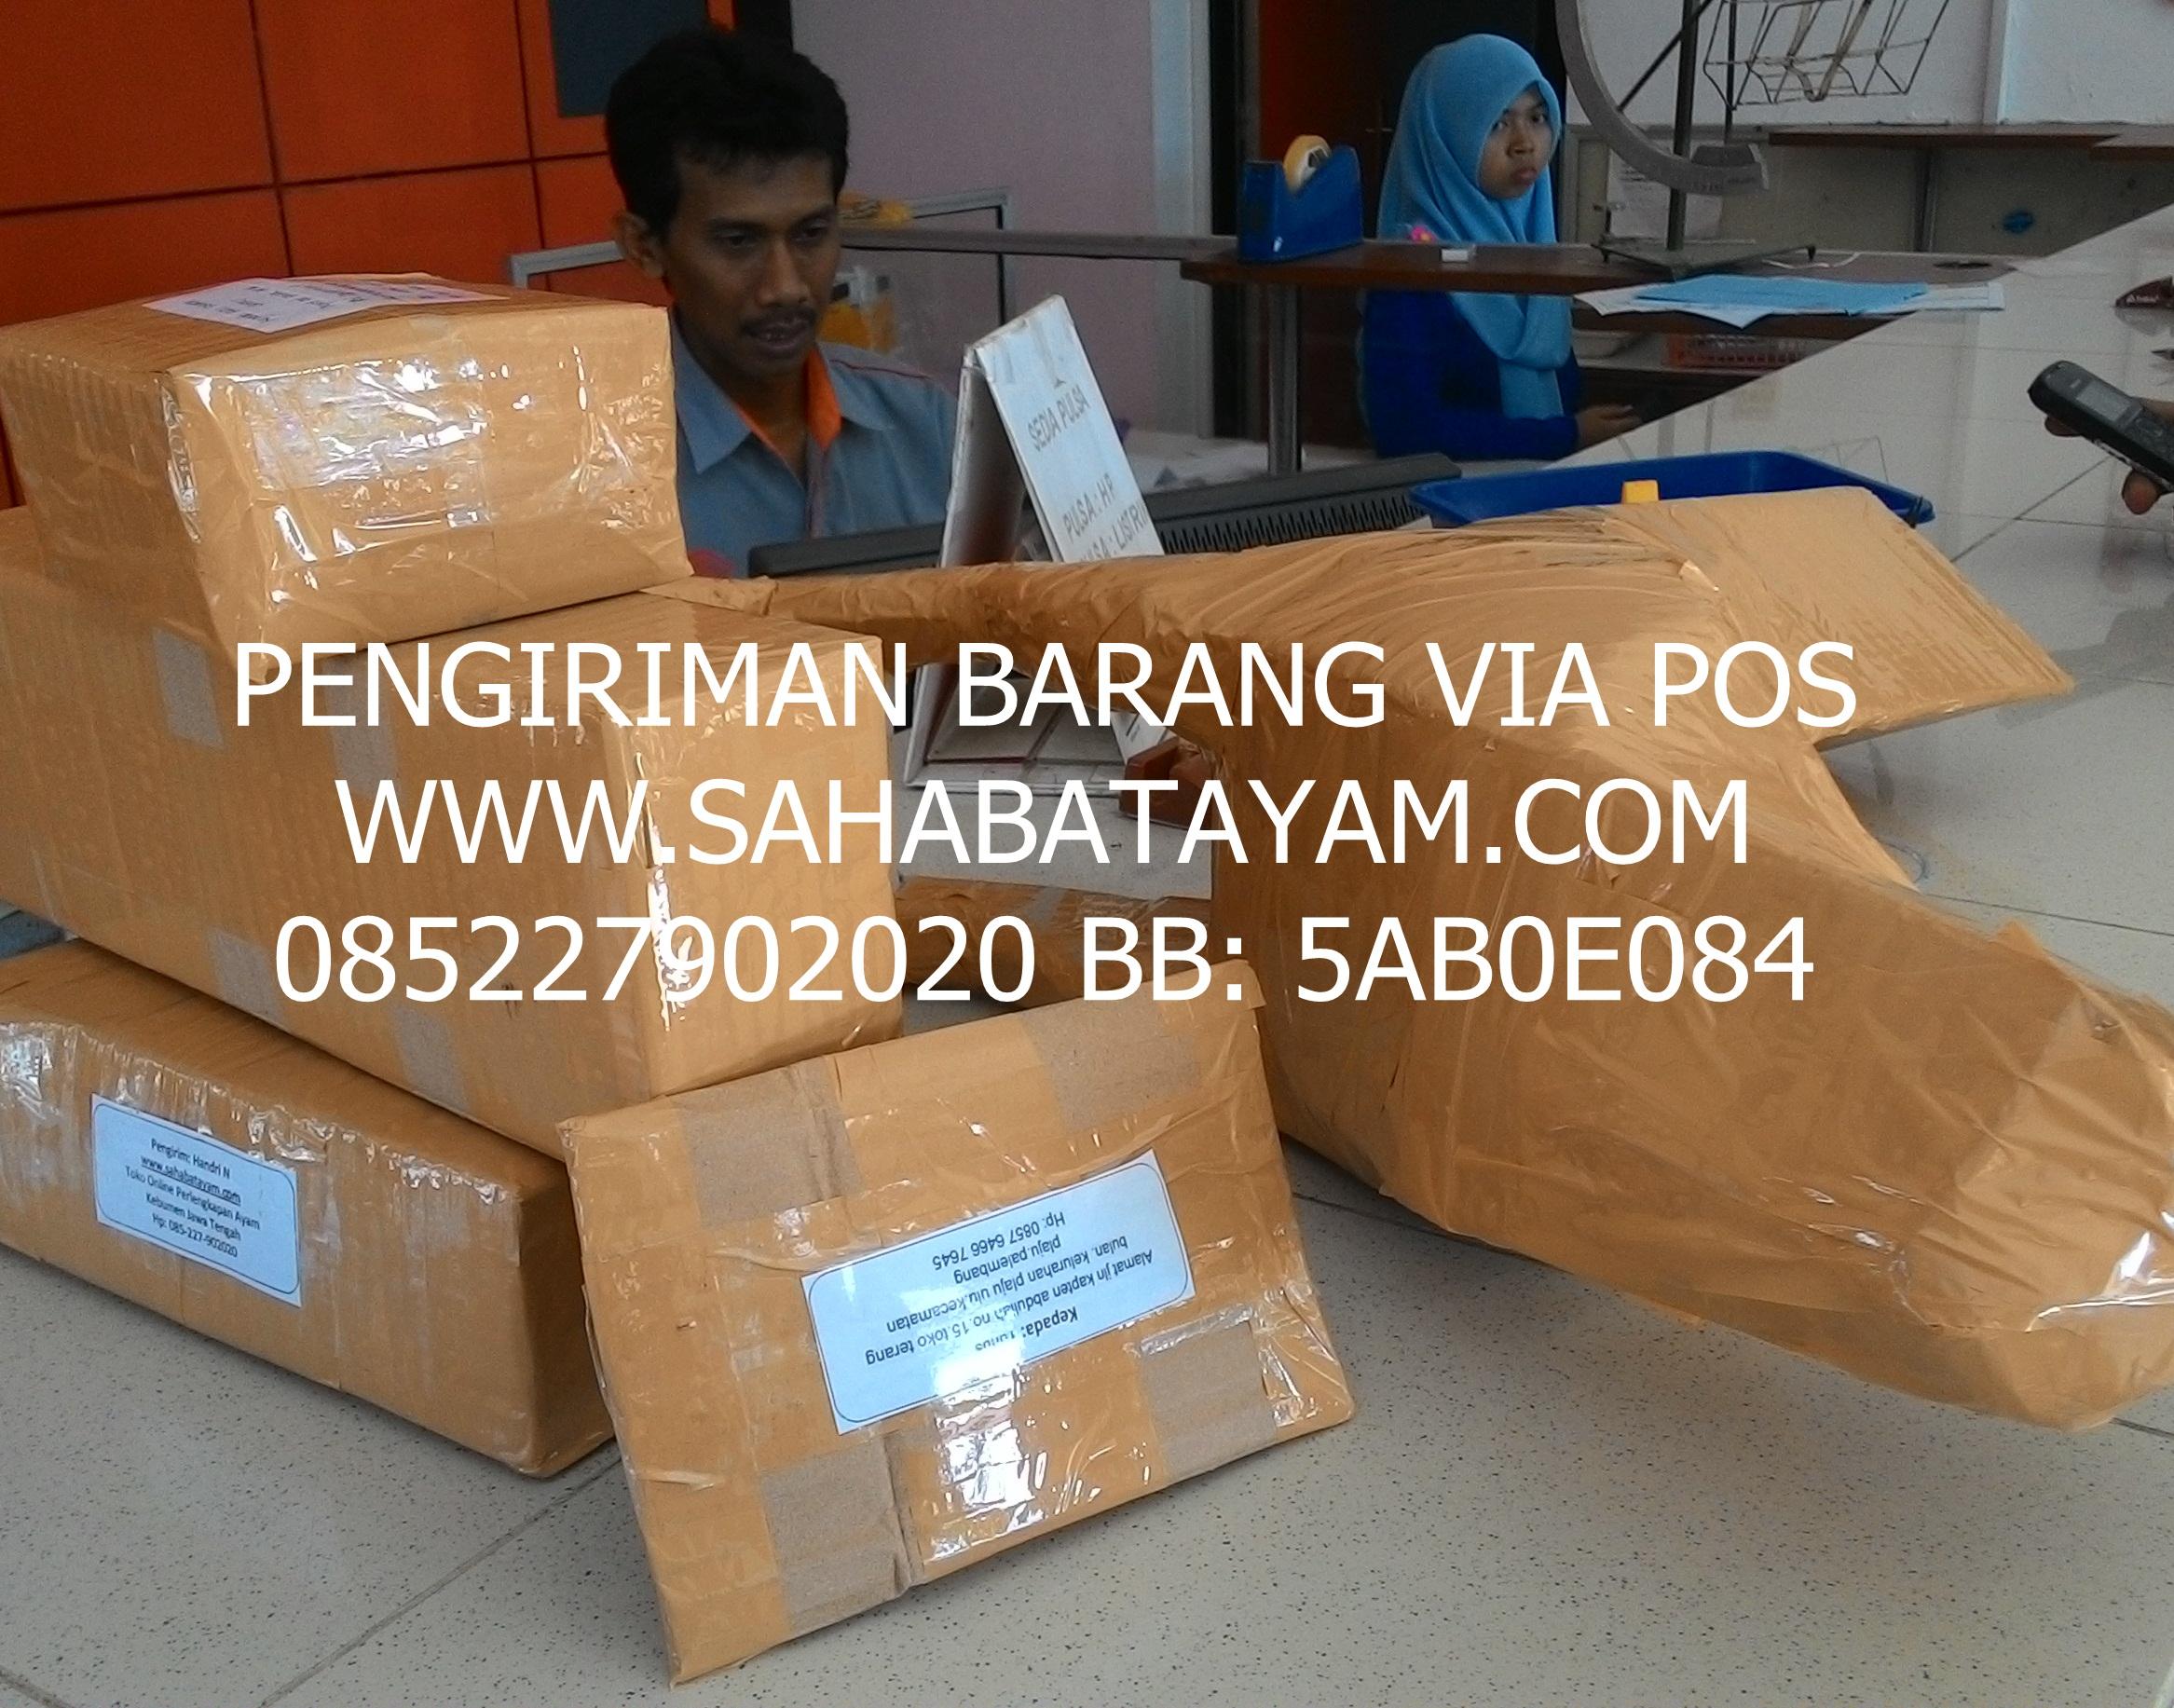 dokumentasi kirim barang www.sahabatayam.com